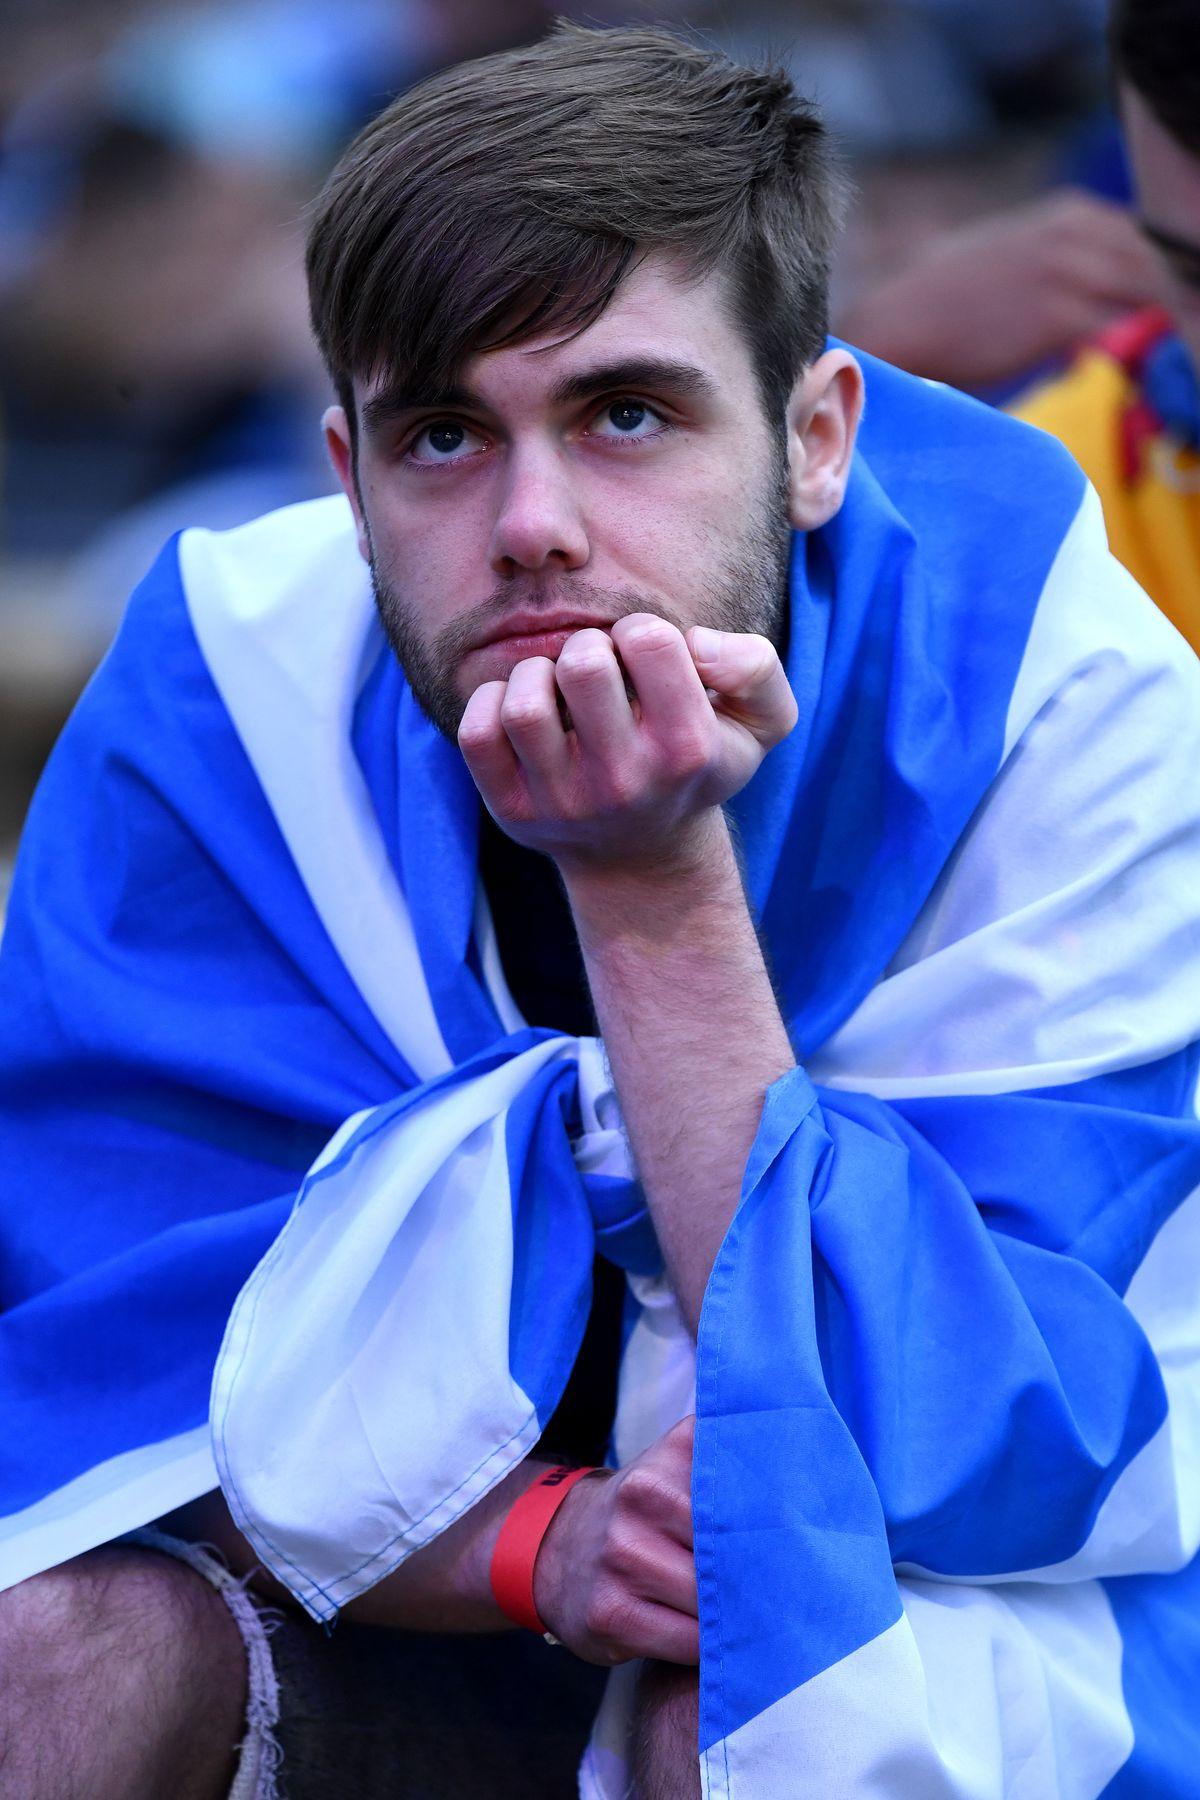 Scotland Football Fans Support Their Team In Euro 2020 Game Against Croatia